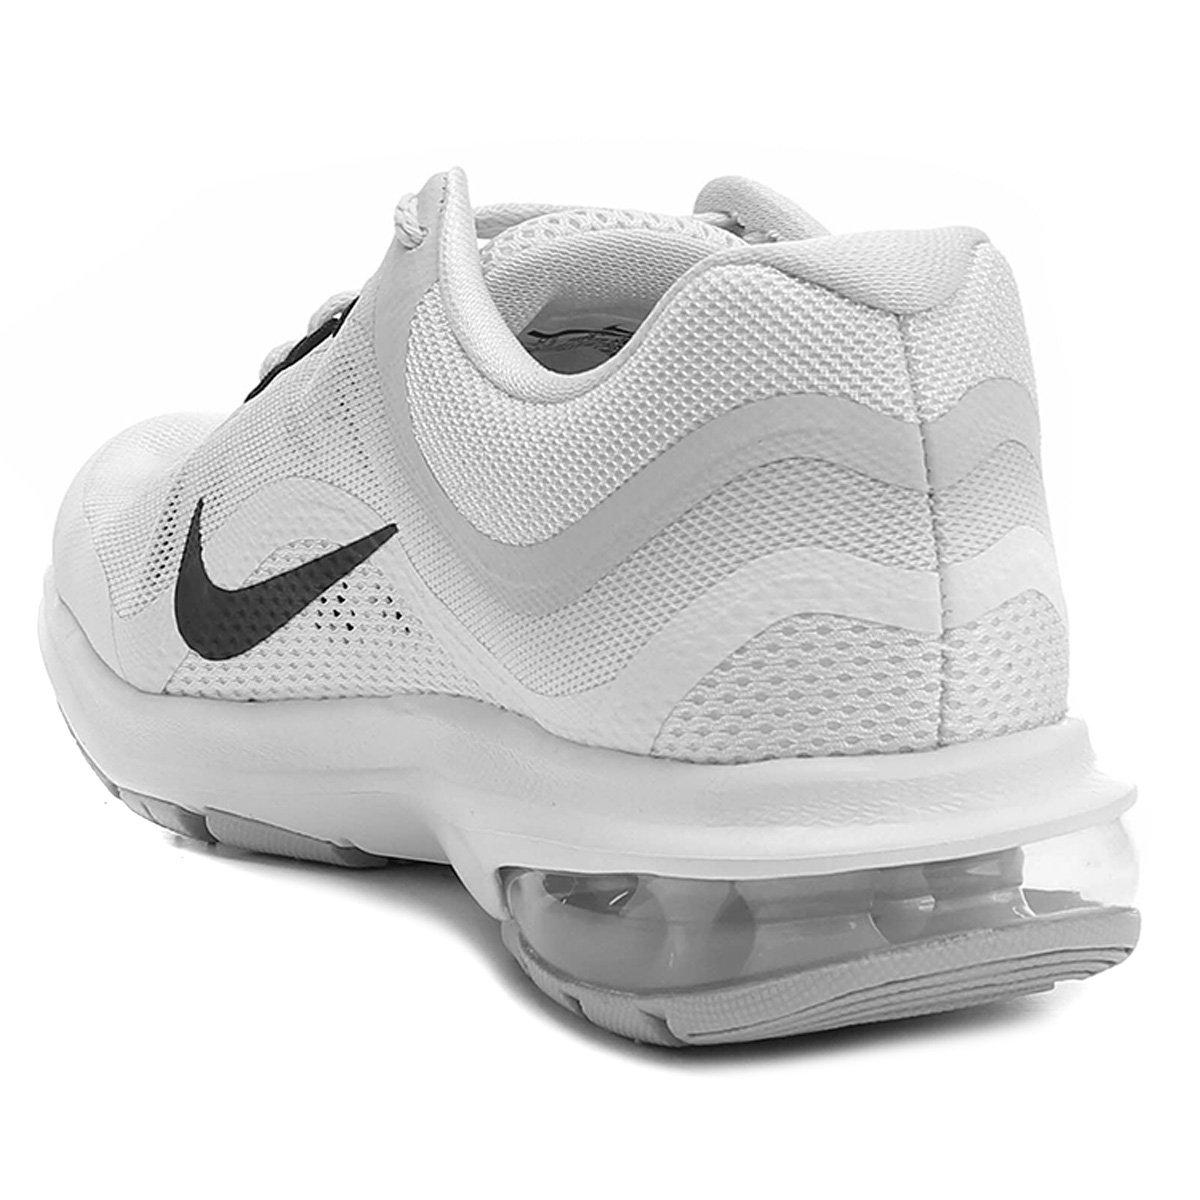 Tênis Nike Air Max Dynasty 2 Feminino - Branco e Preto - Compre ... a91cd64df539b